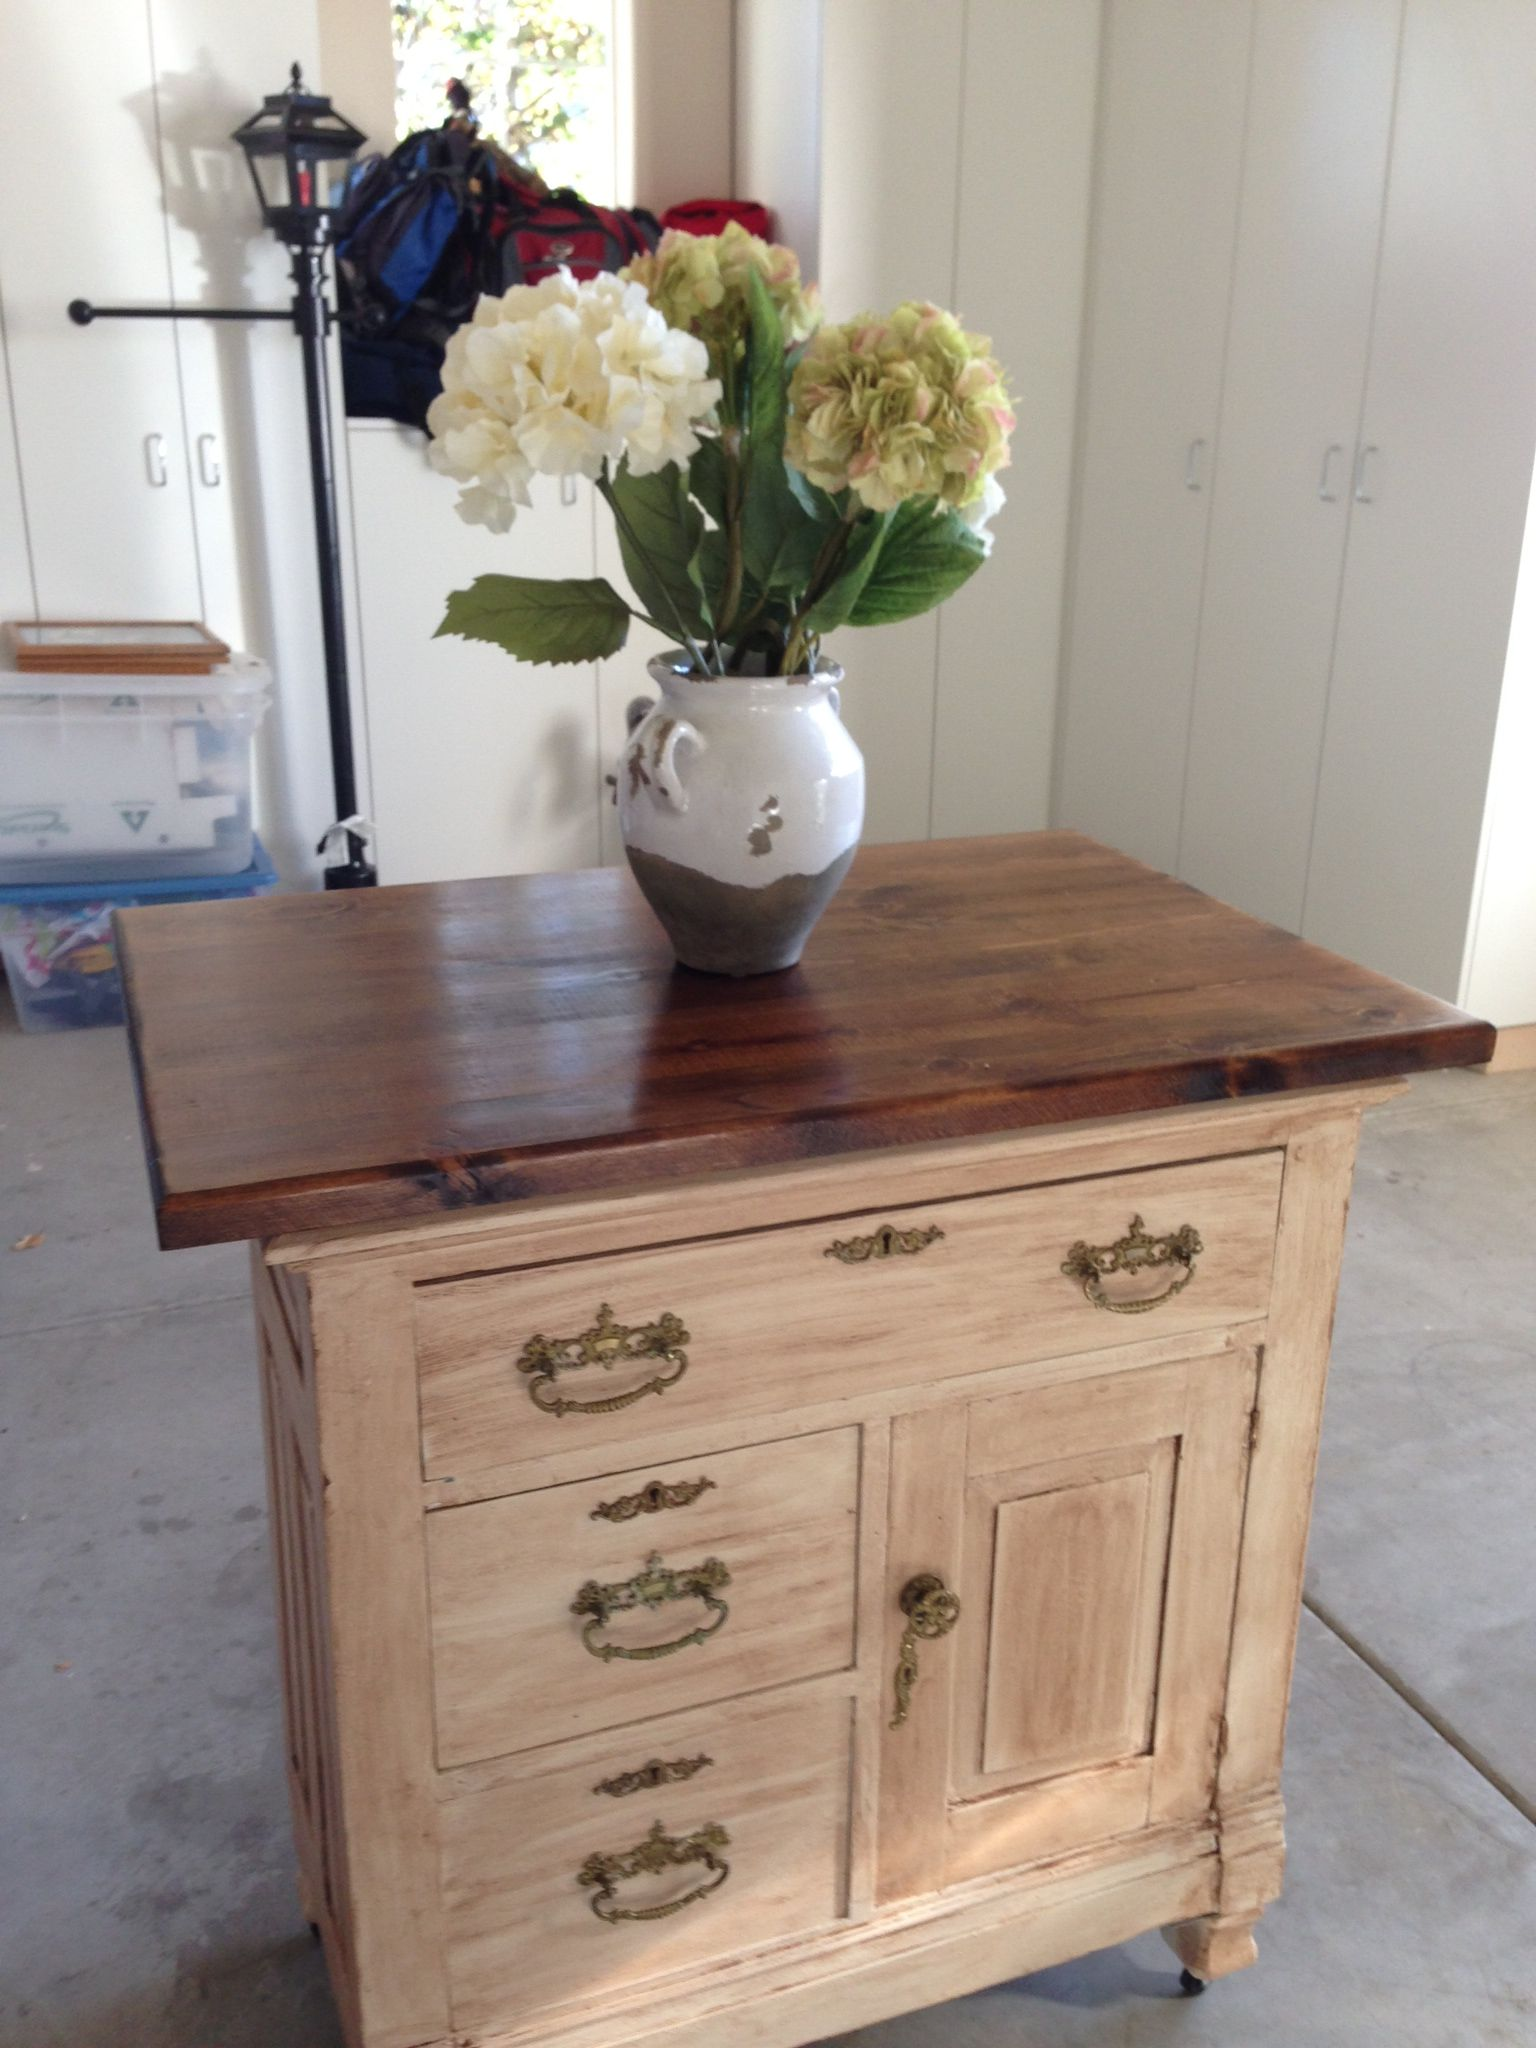 Turn A Dresser Into A Kitchen Island: Old Antique Dresser Turned Into Kitchen Island! My Mother